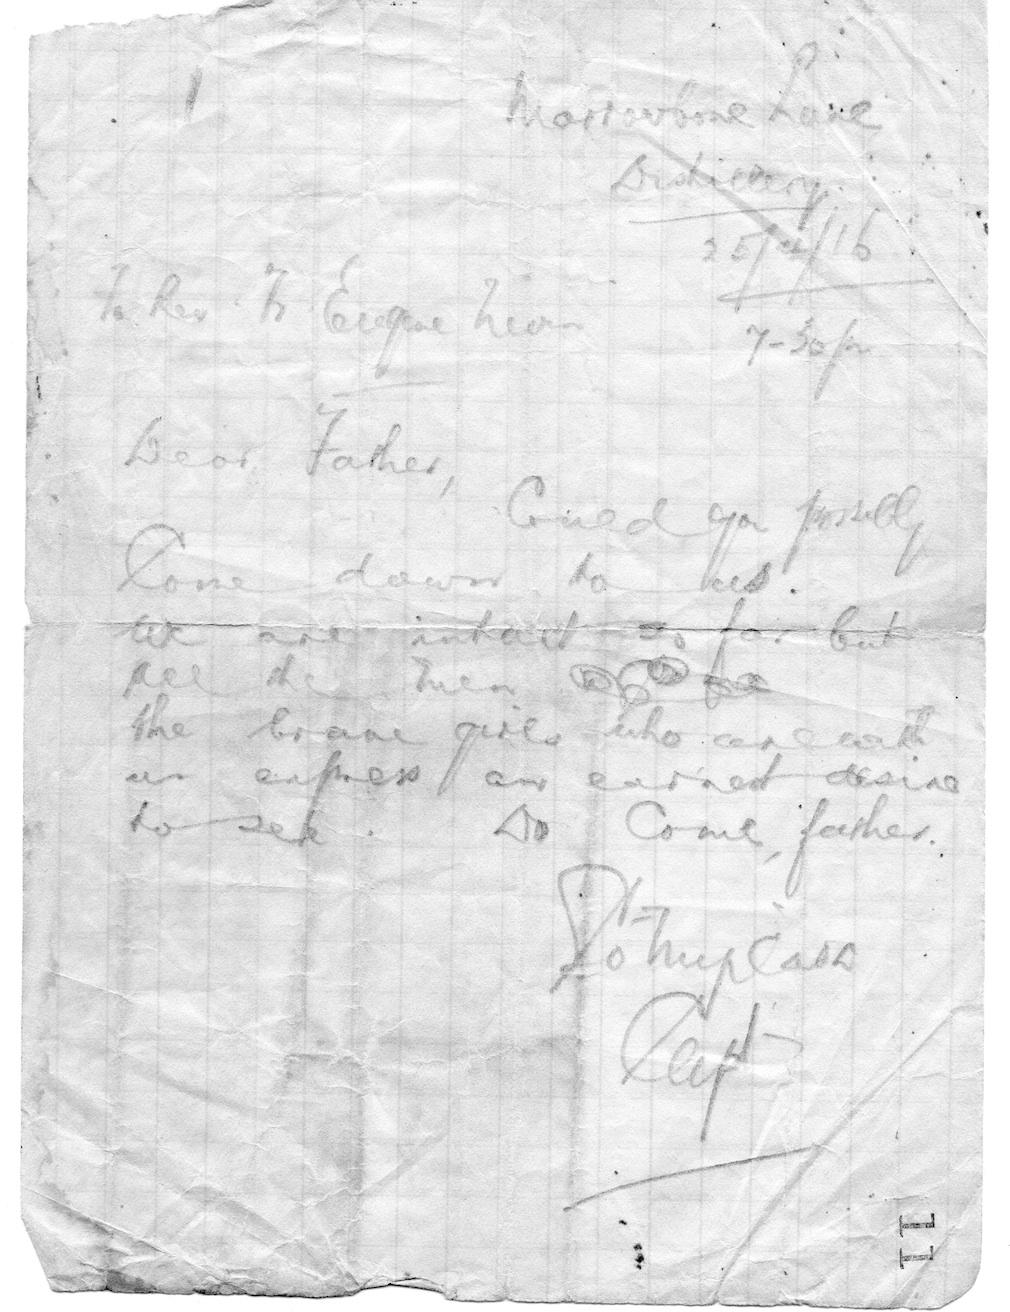 Letter to Fr Eugene dated 25/4/16